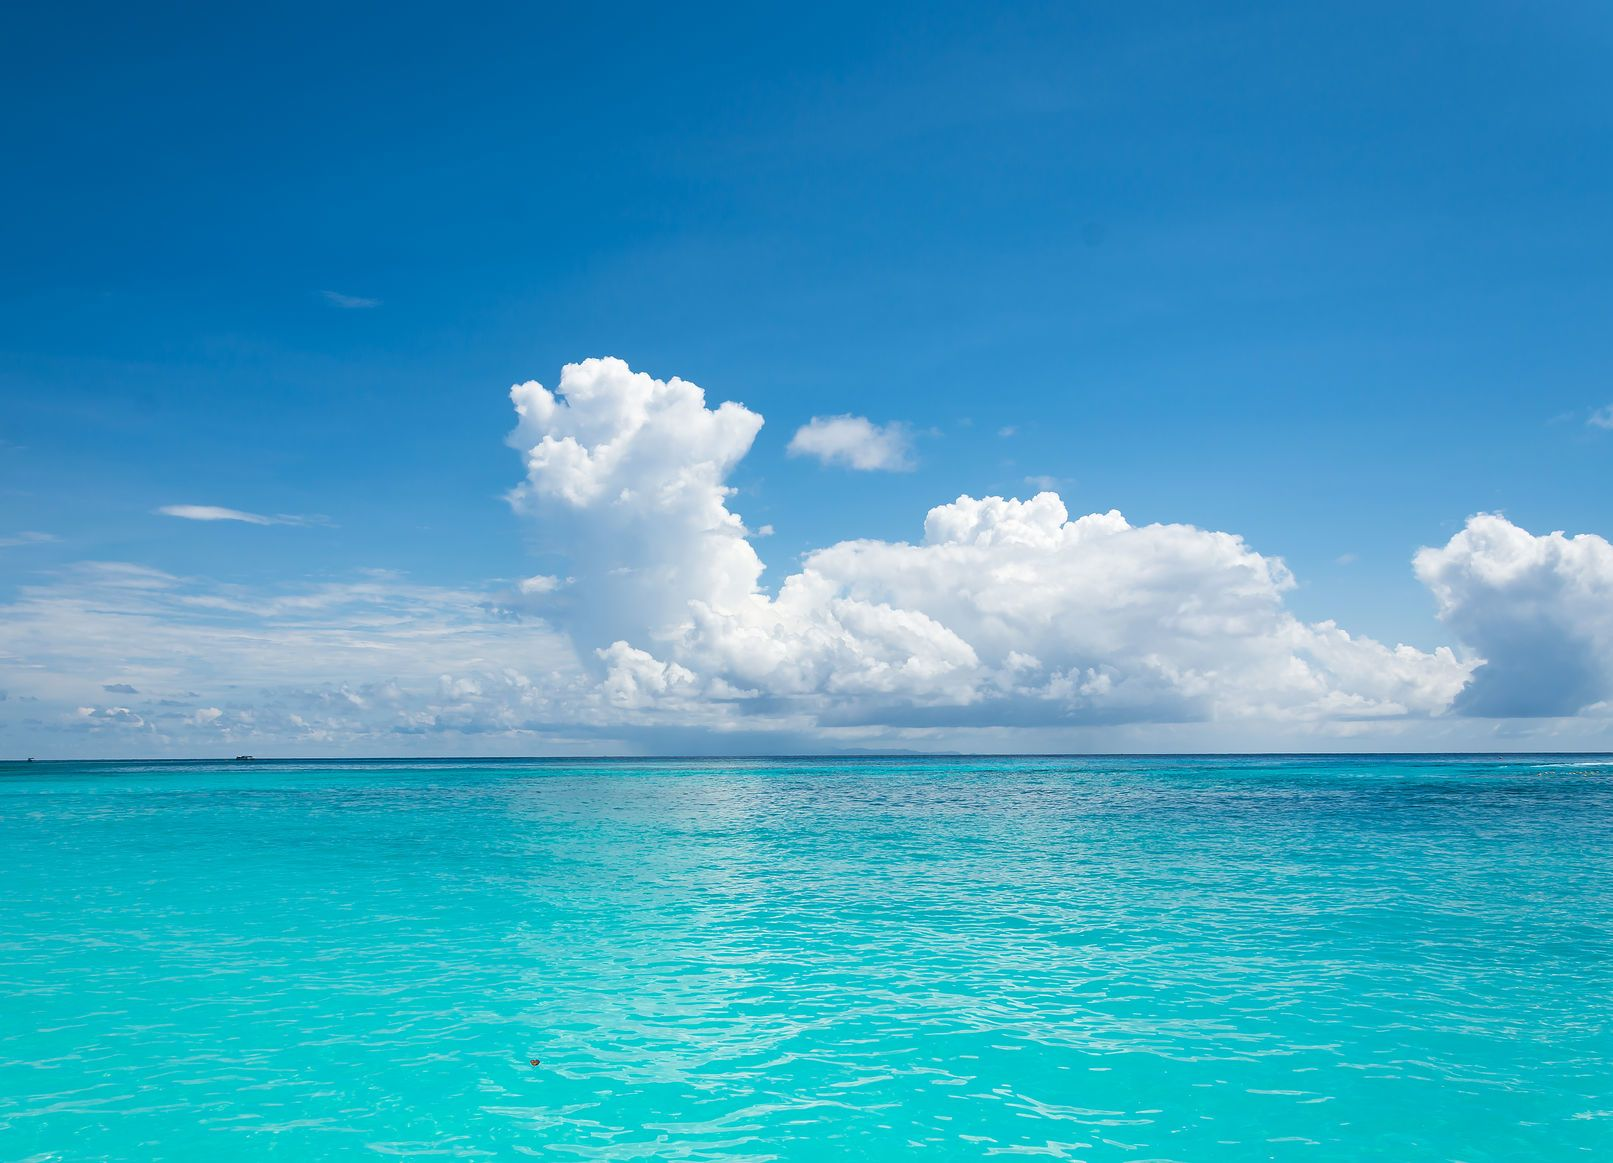 Modrá obloha a oceán | topntp/123RF.com